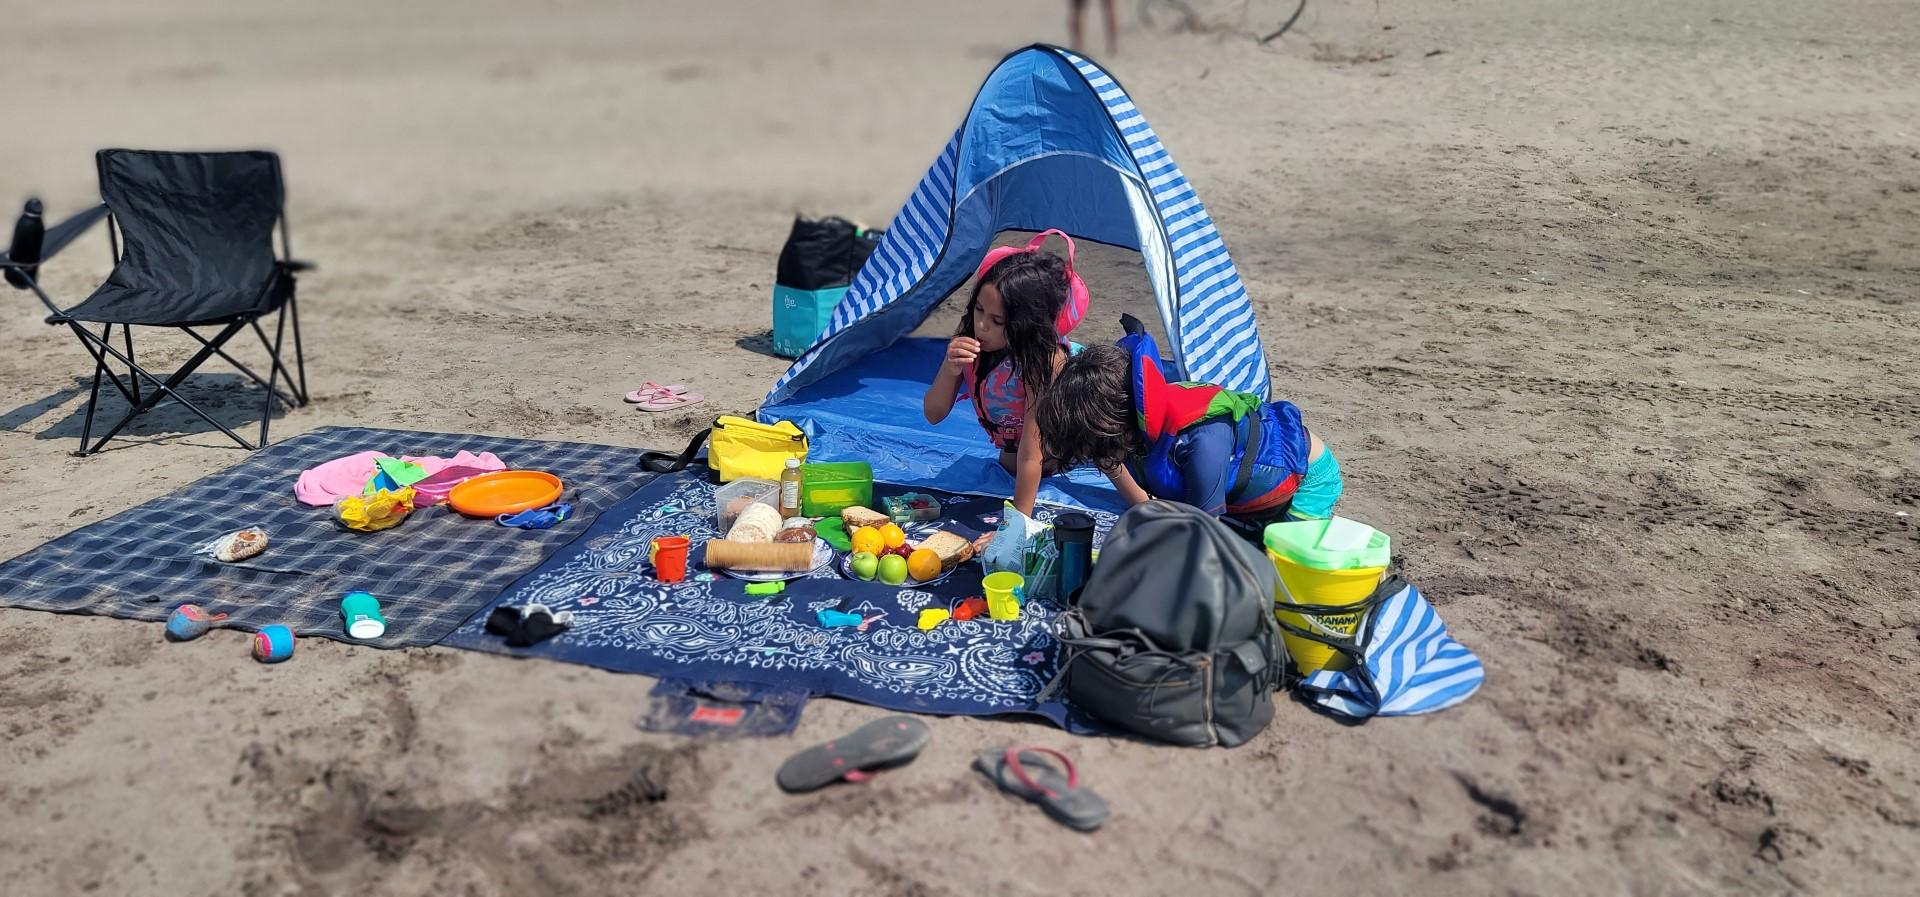 kids having a picnic at the beach